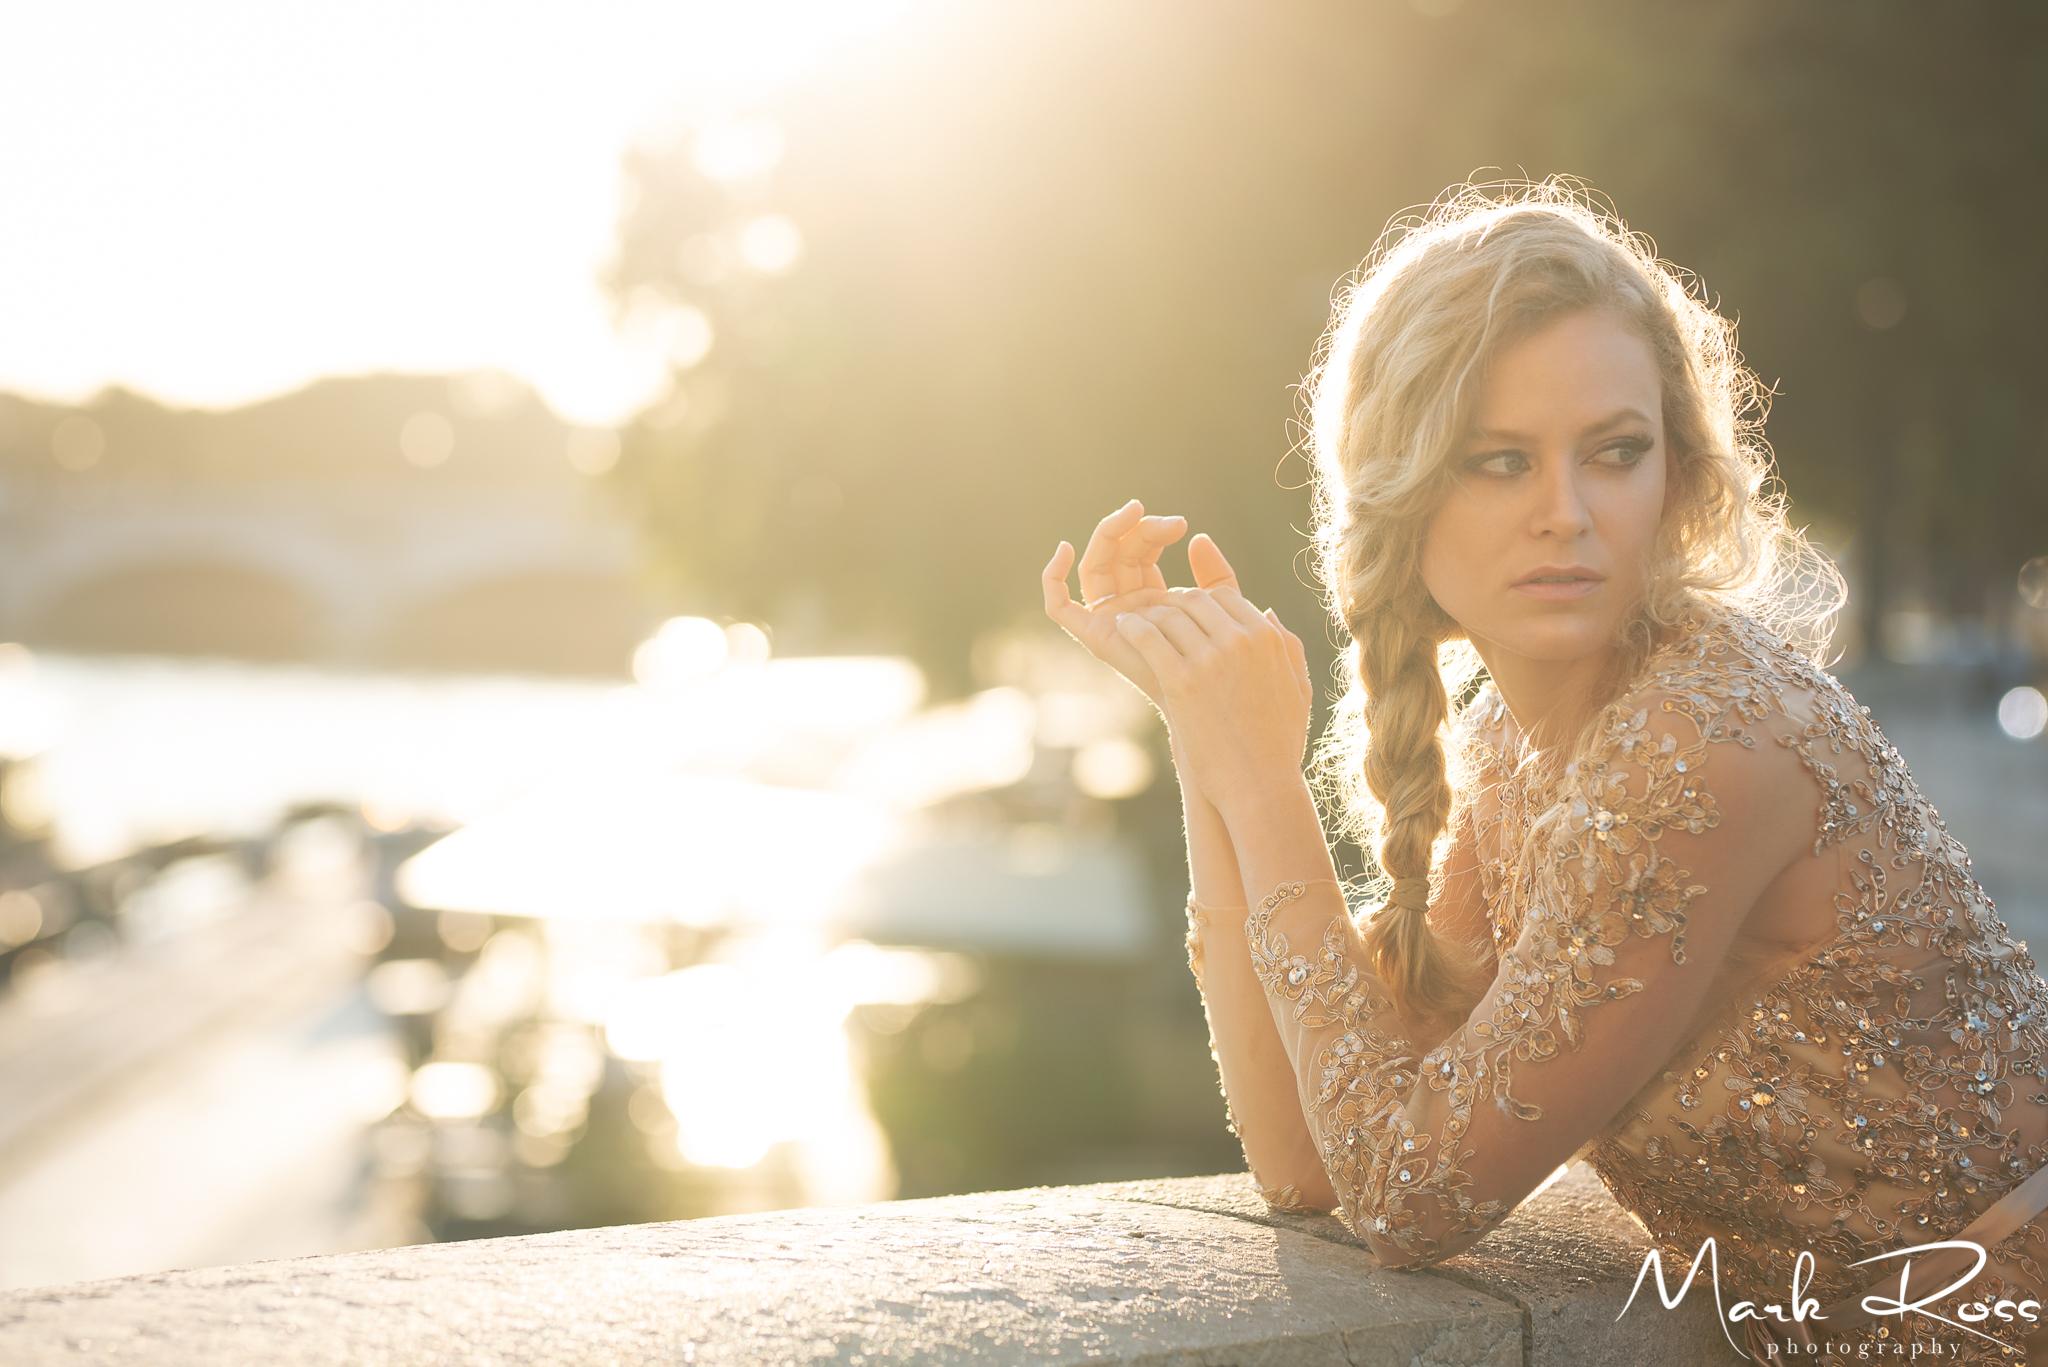 Denver-Portrait-Photographer-Mark-Ross-Photography-Maggie-Paris-2018-Gold-Web-Resolution-Watermarked-2.JPG